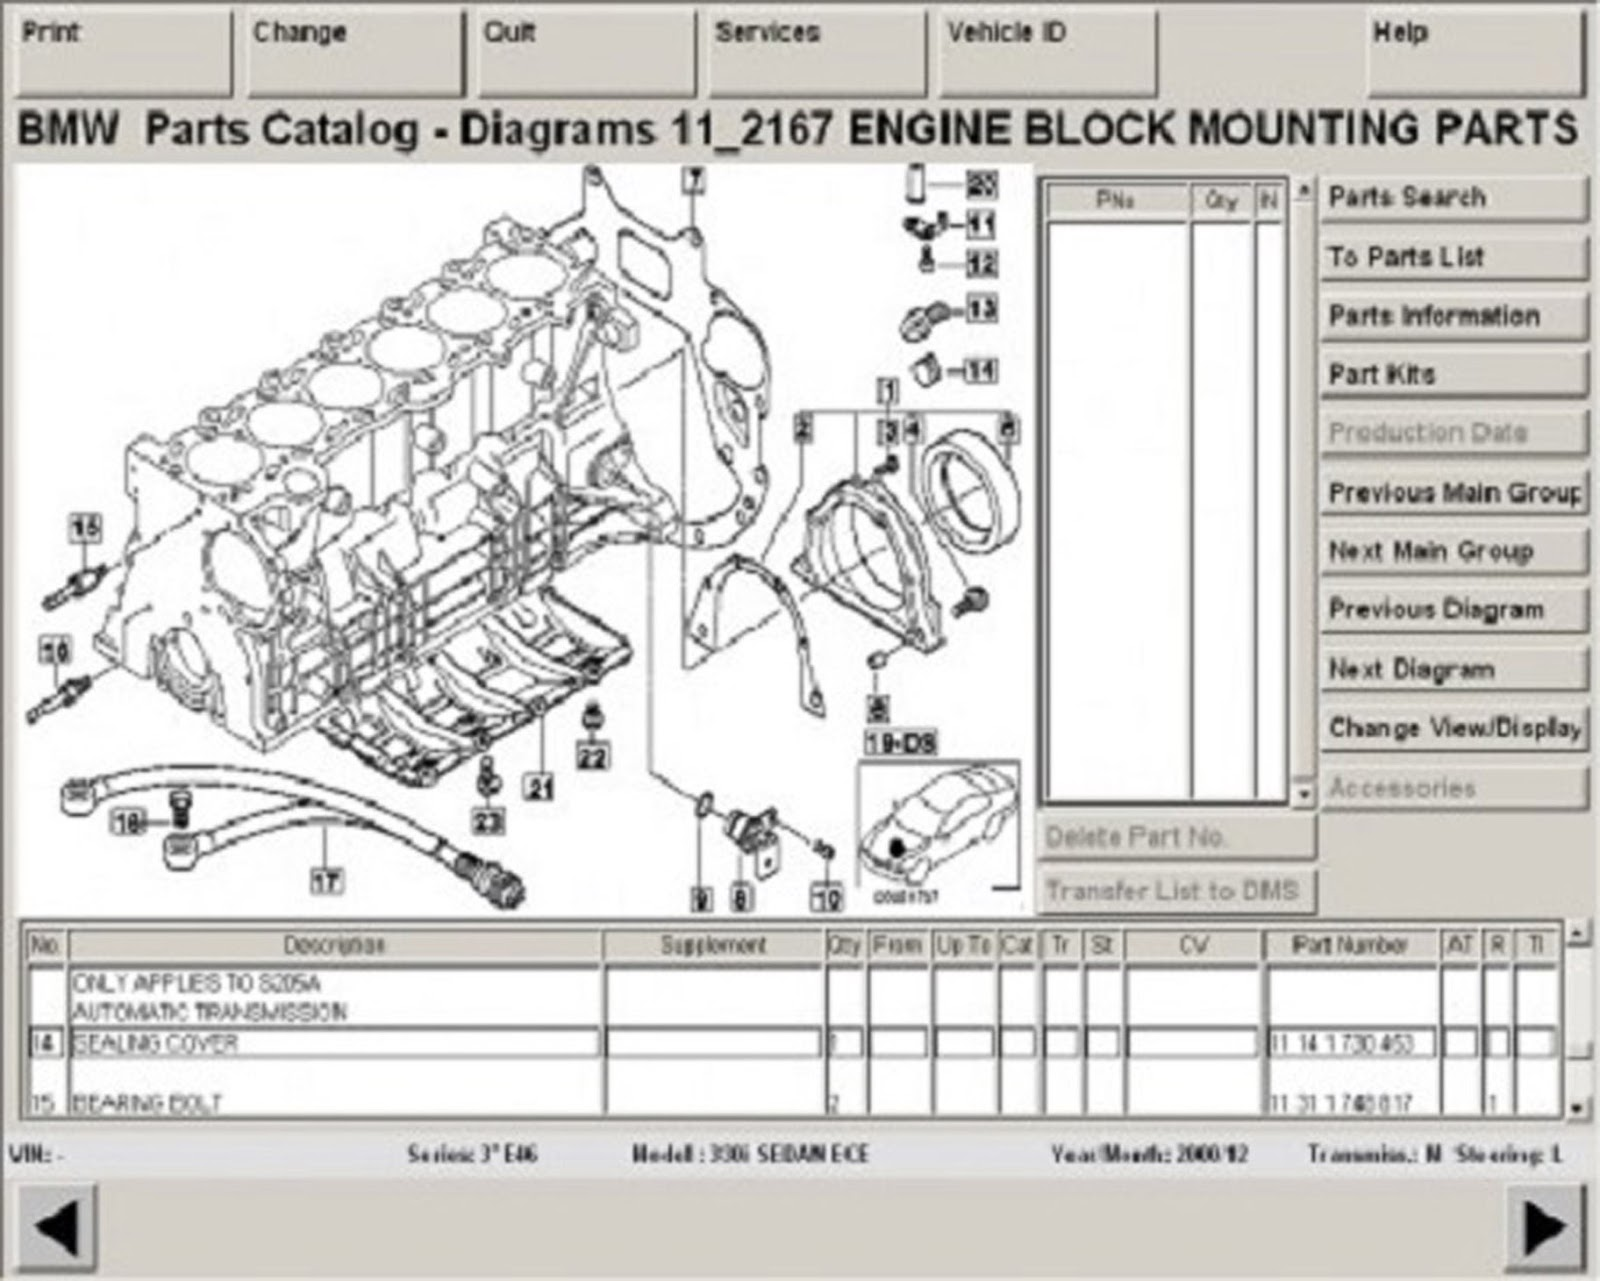 hight resolution of bmw workshop service repair manuals tis wds epc etk etm obd2 jombang electrical wiring diagram